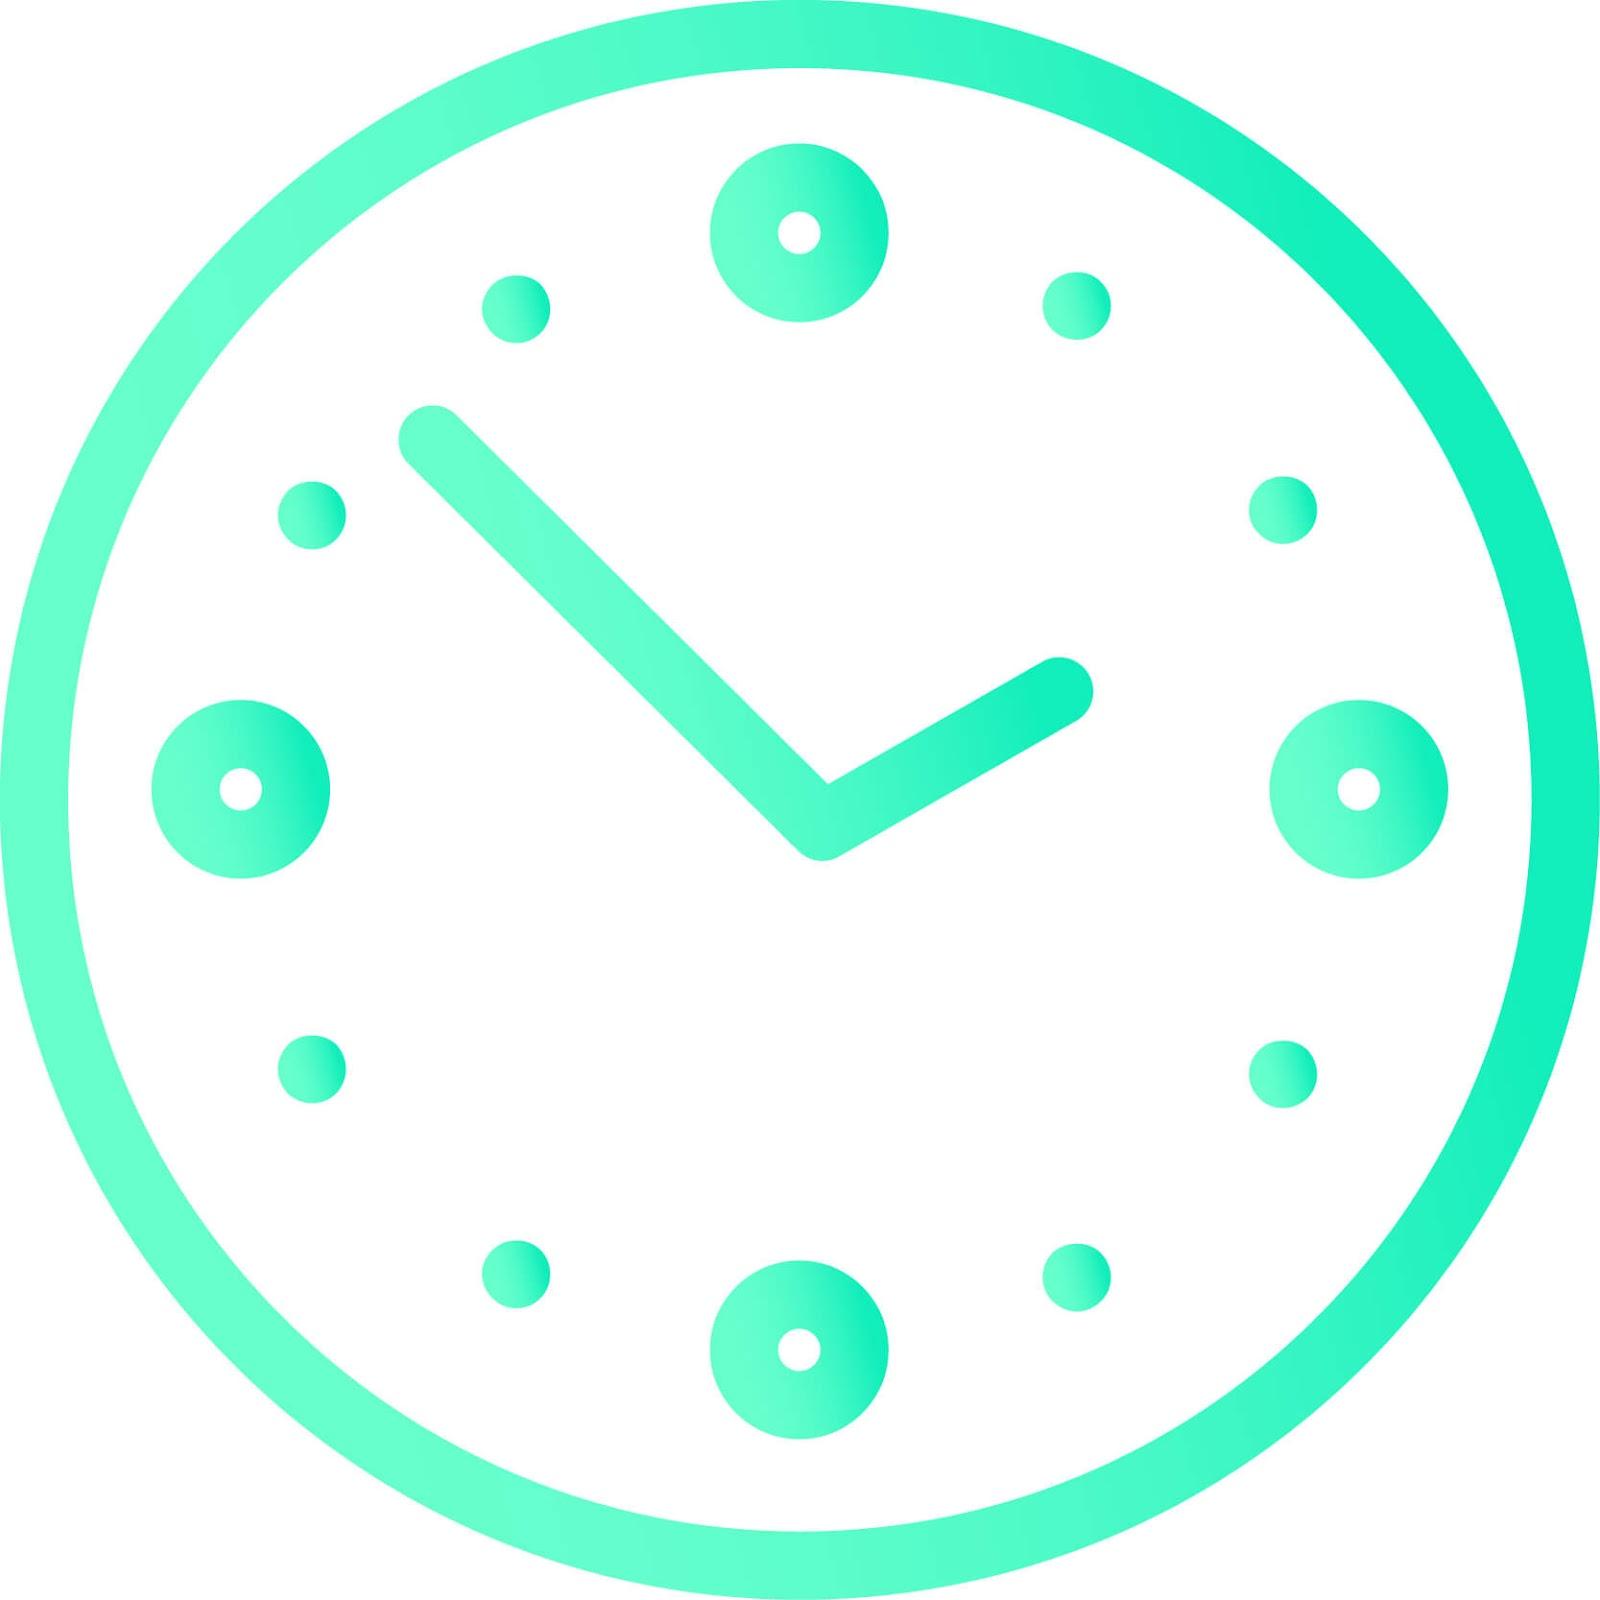 Set time-bound KPIs using the SMART goal framework.